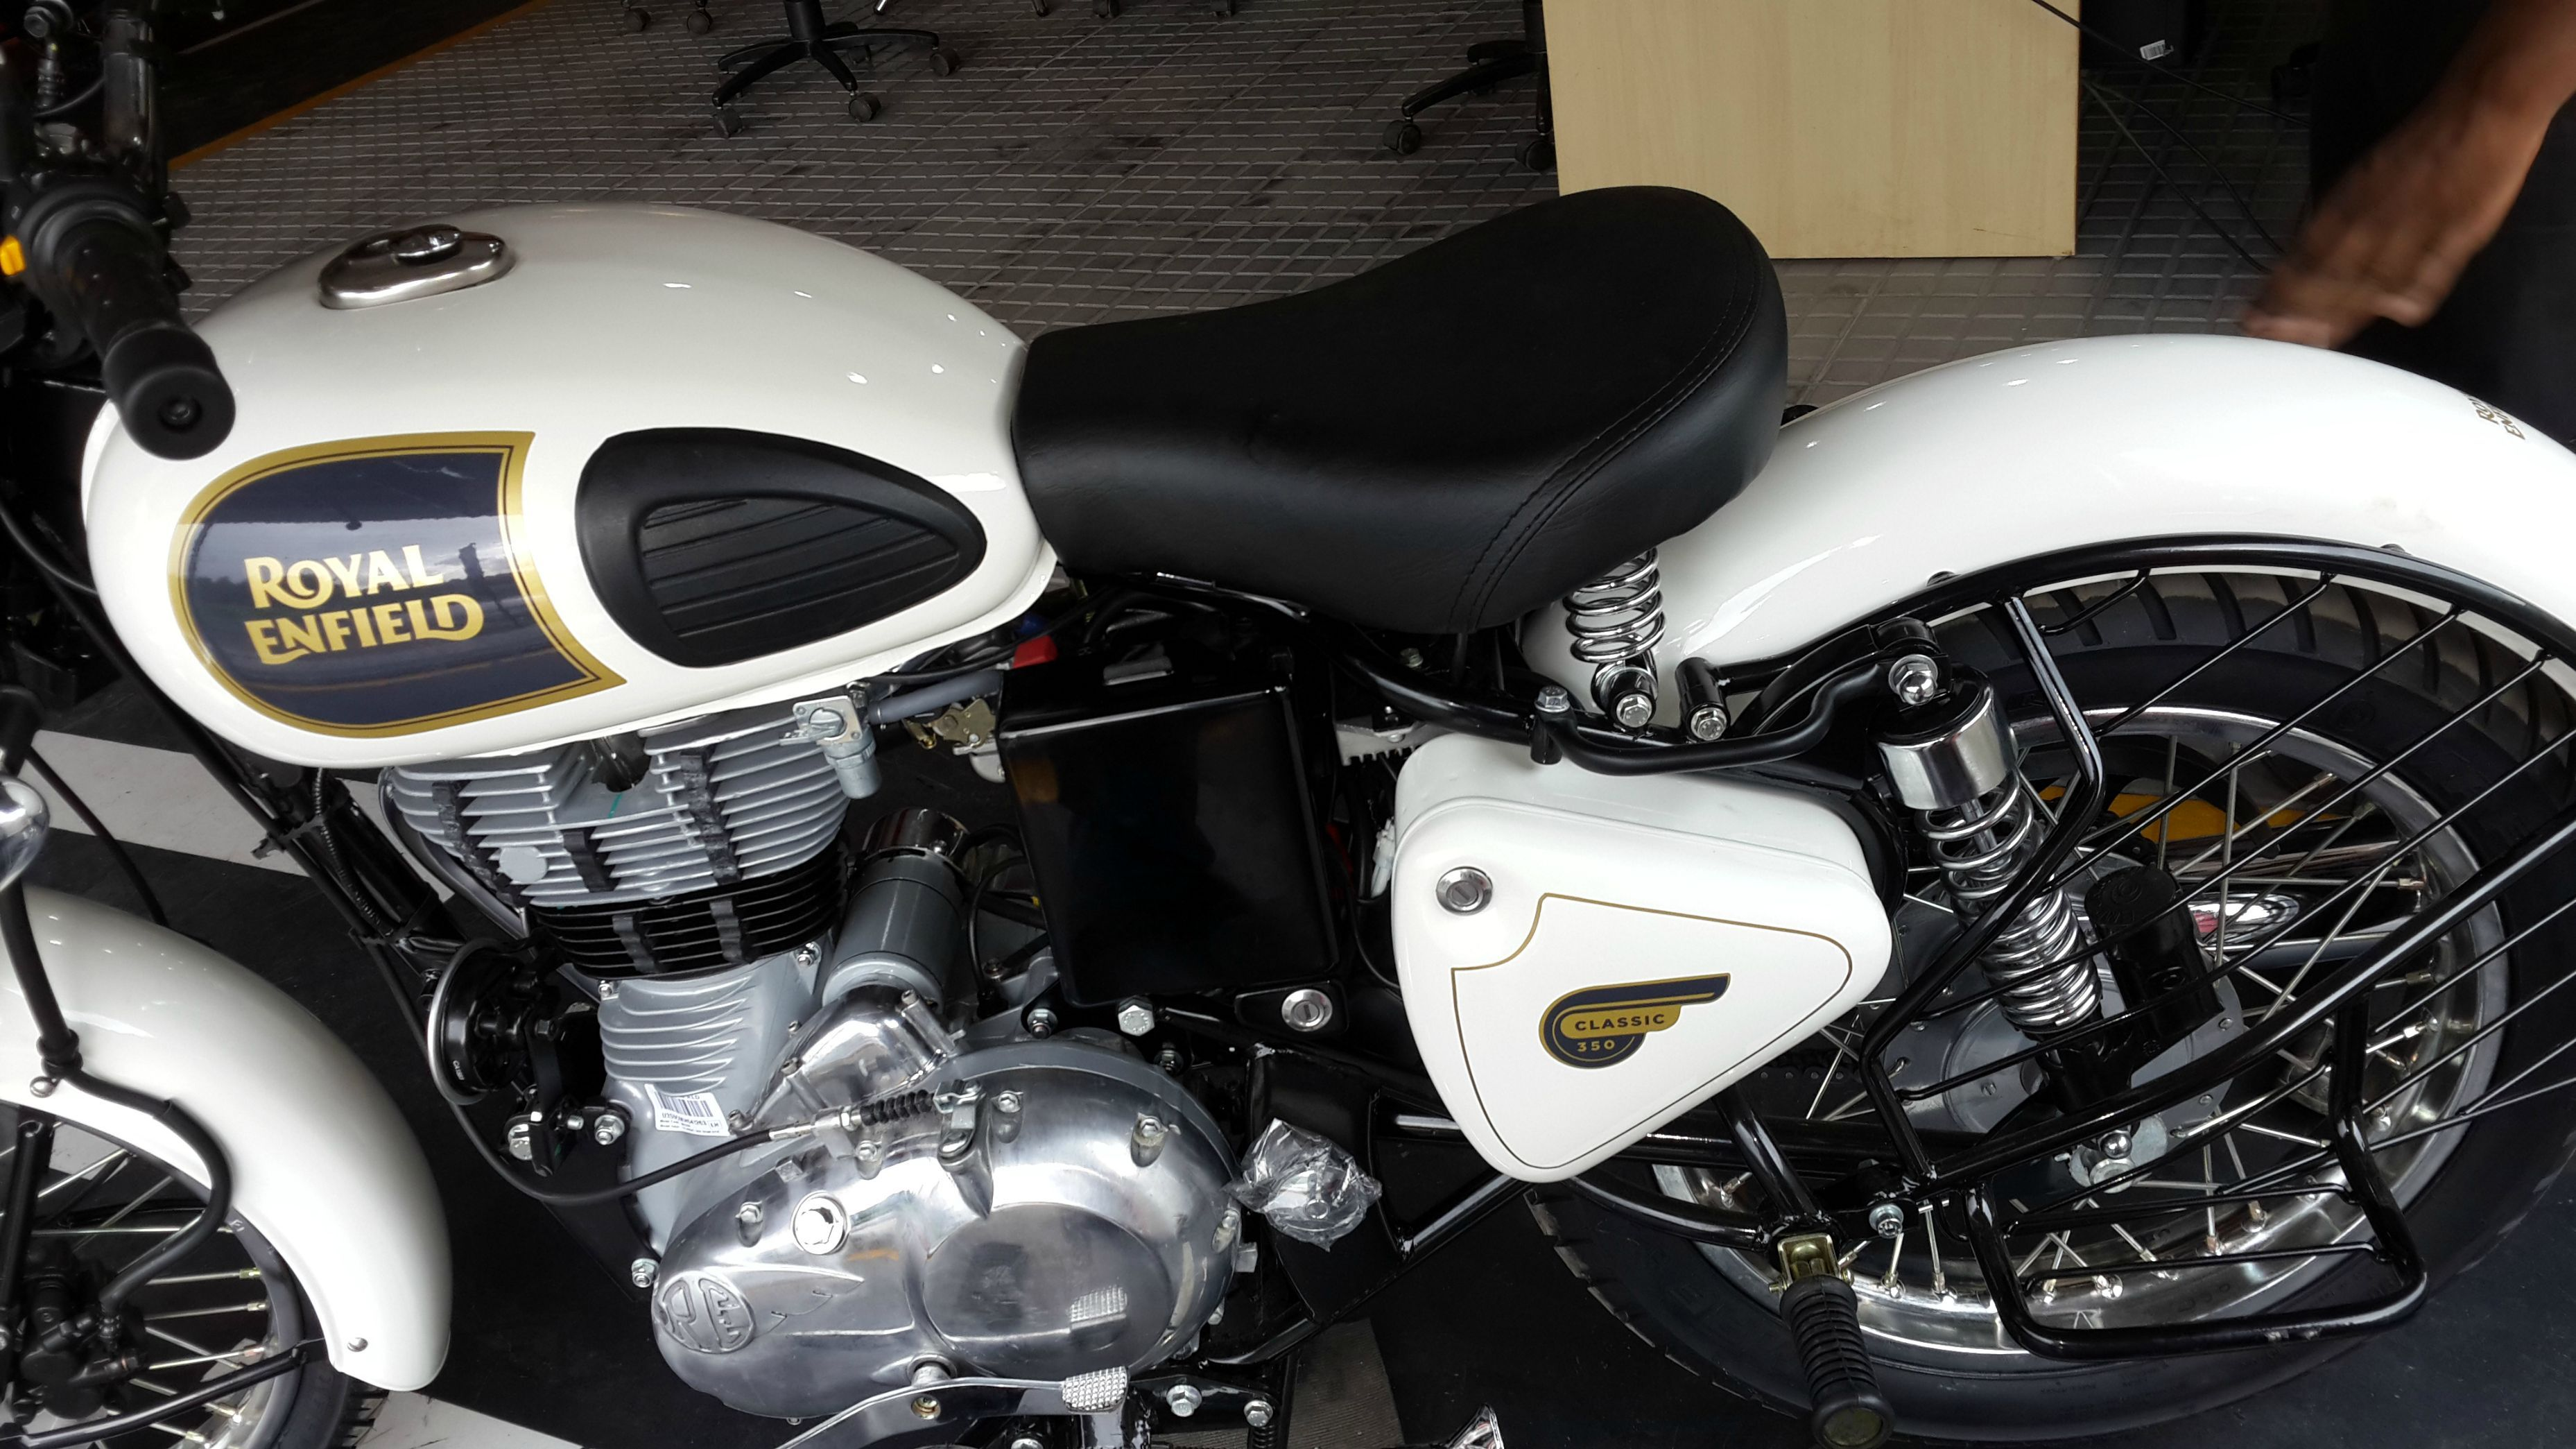 Royal enfield thunderbird 500cc price in nepal - Royal Enfield Images Profile Royal Enfield